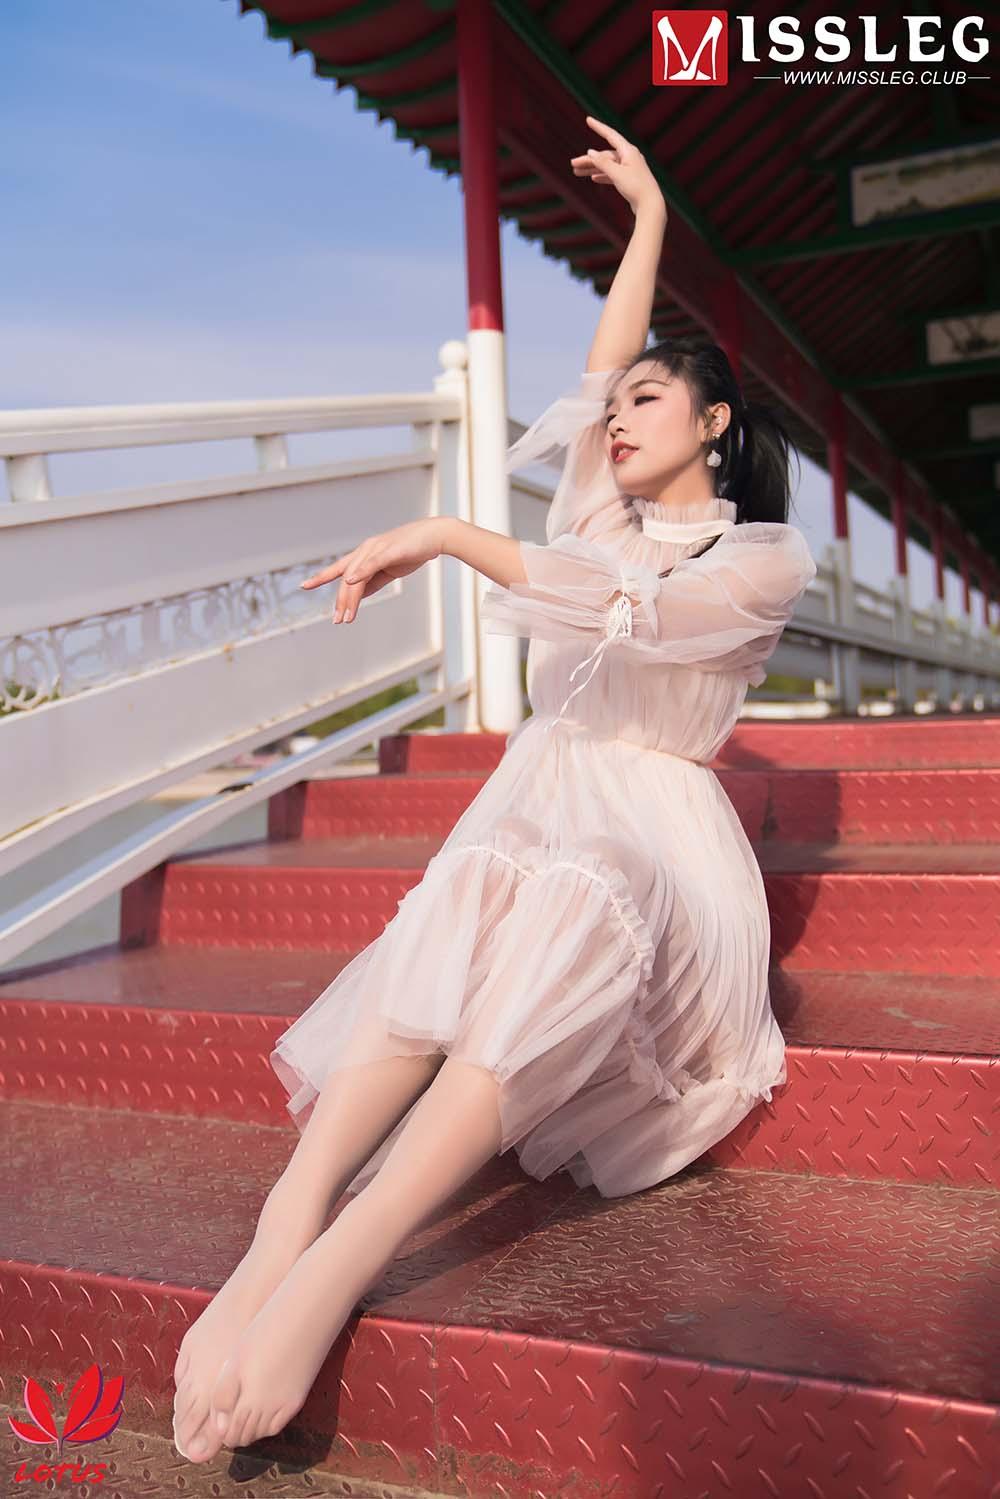 [MISSLEG蜜丝]室内M系列 钻石版 2019.11.15 M018 小鬼3[/265MB]